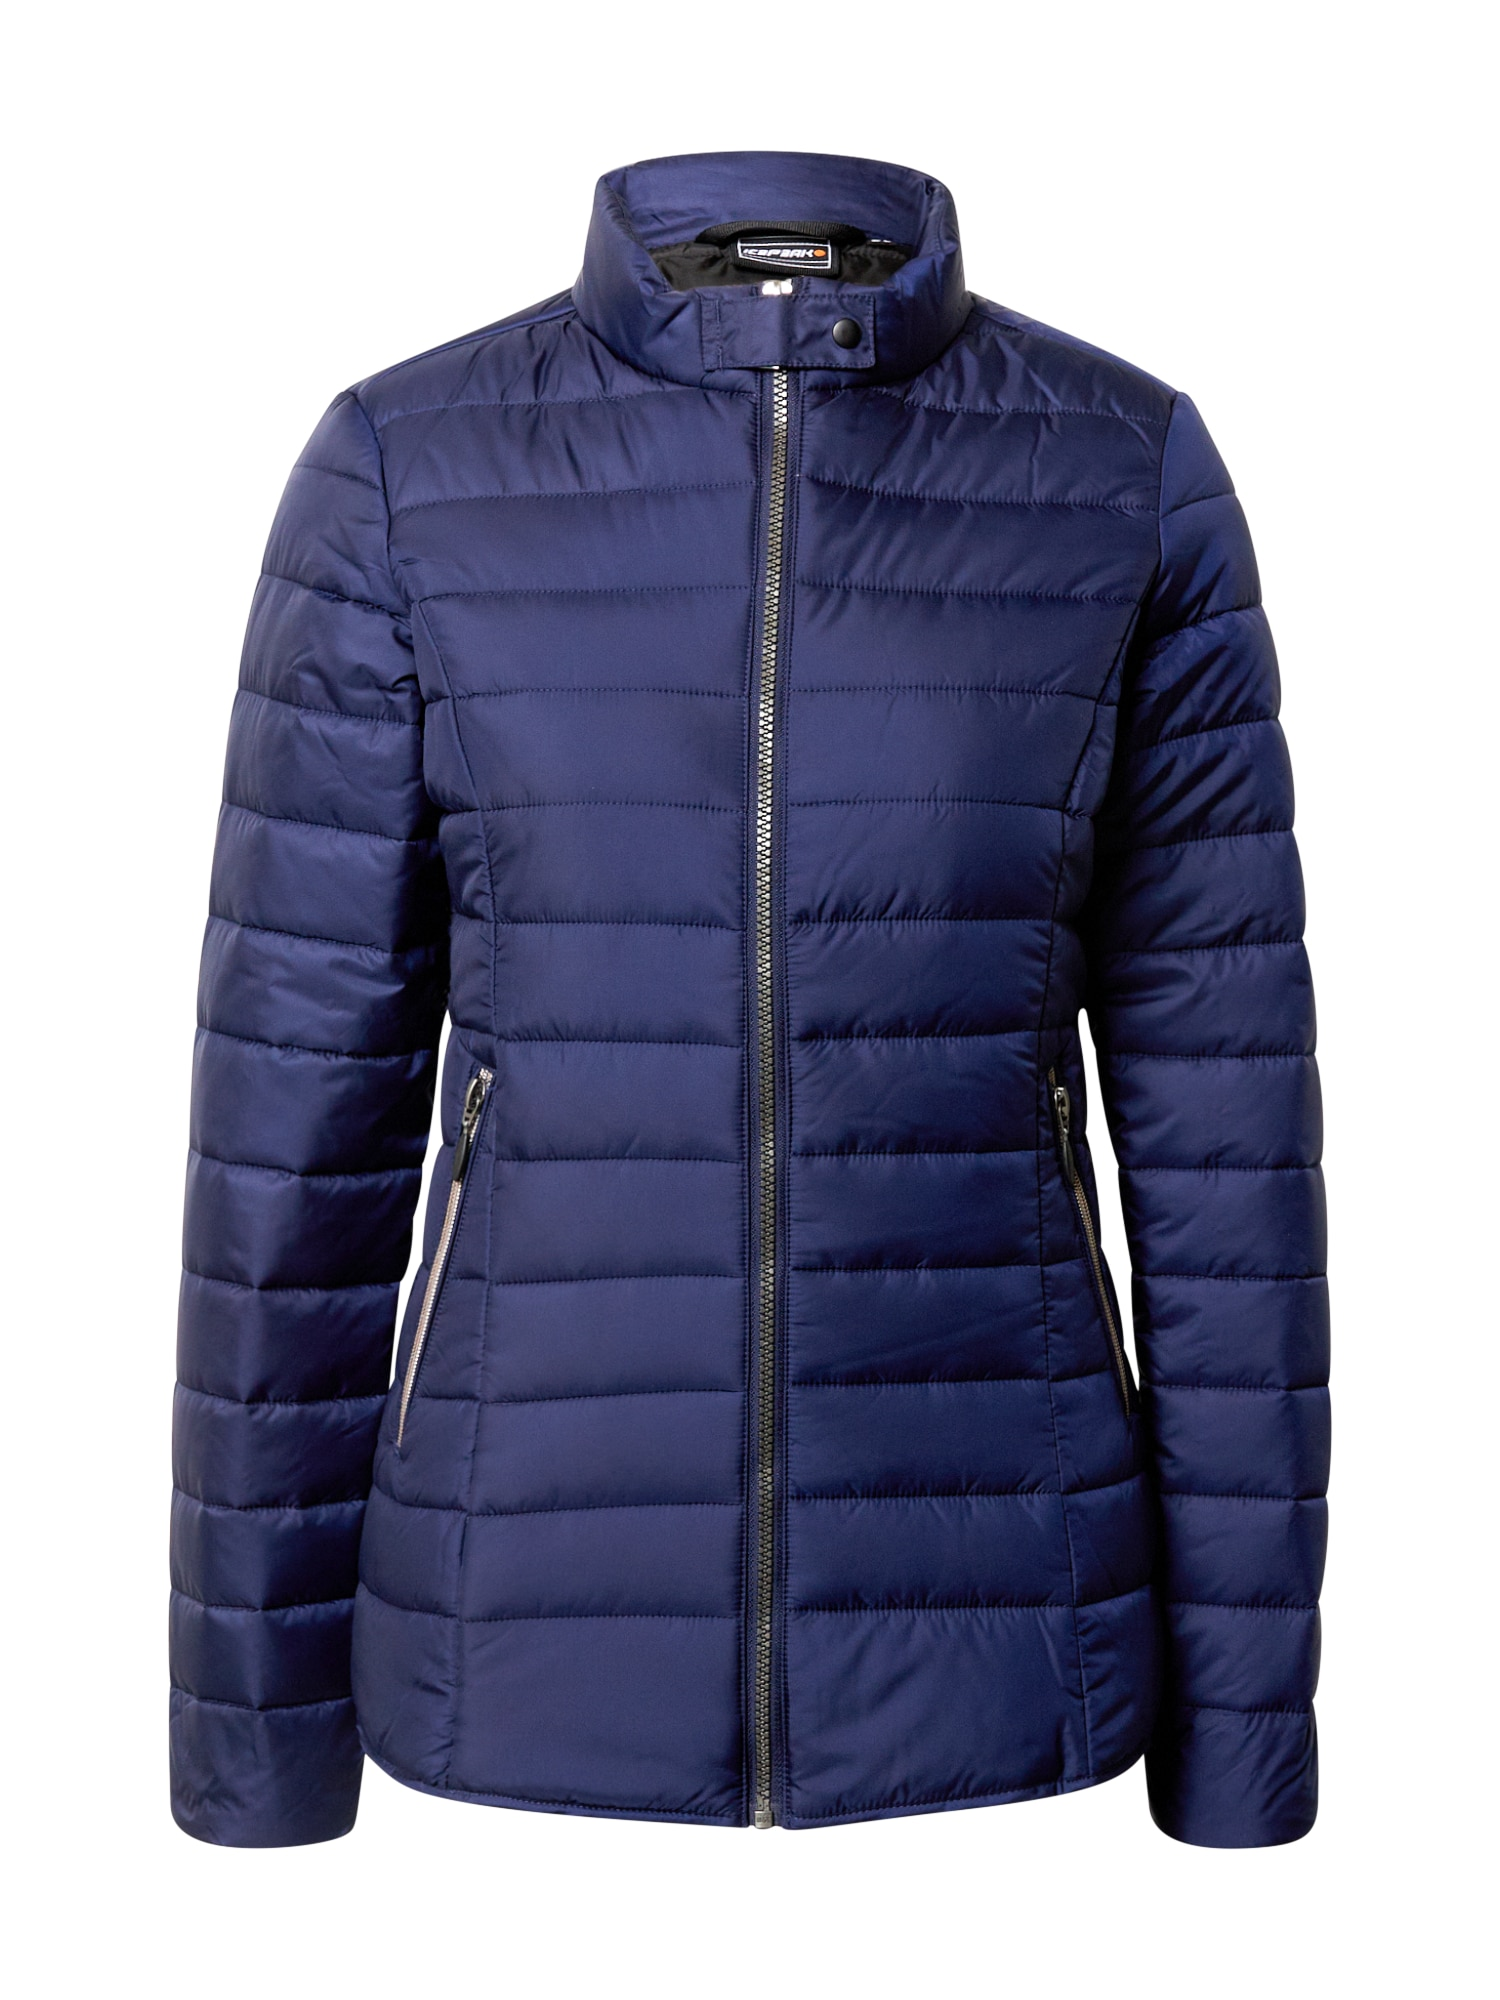 ICEPEAK Outdoorová bunda 'PEORIA'  marine modrá